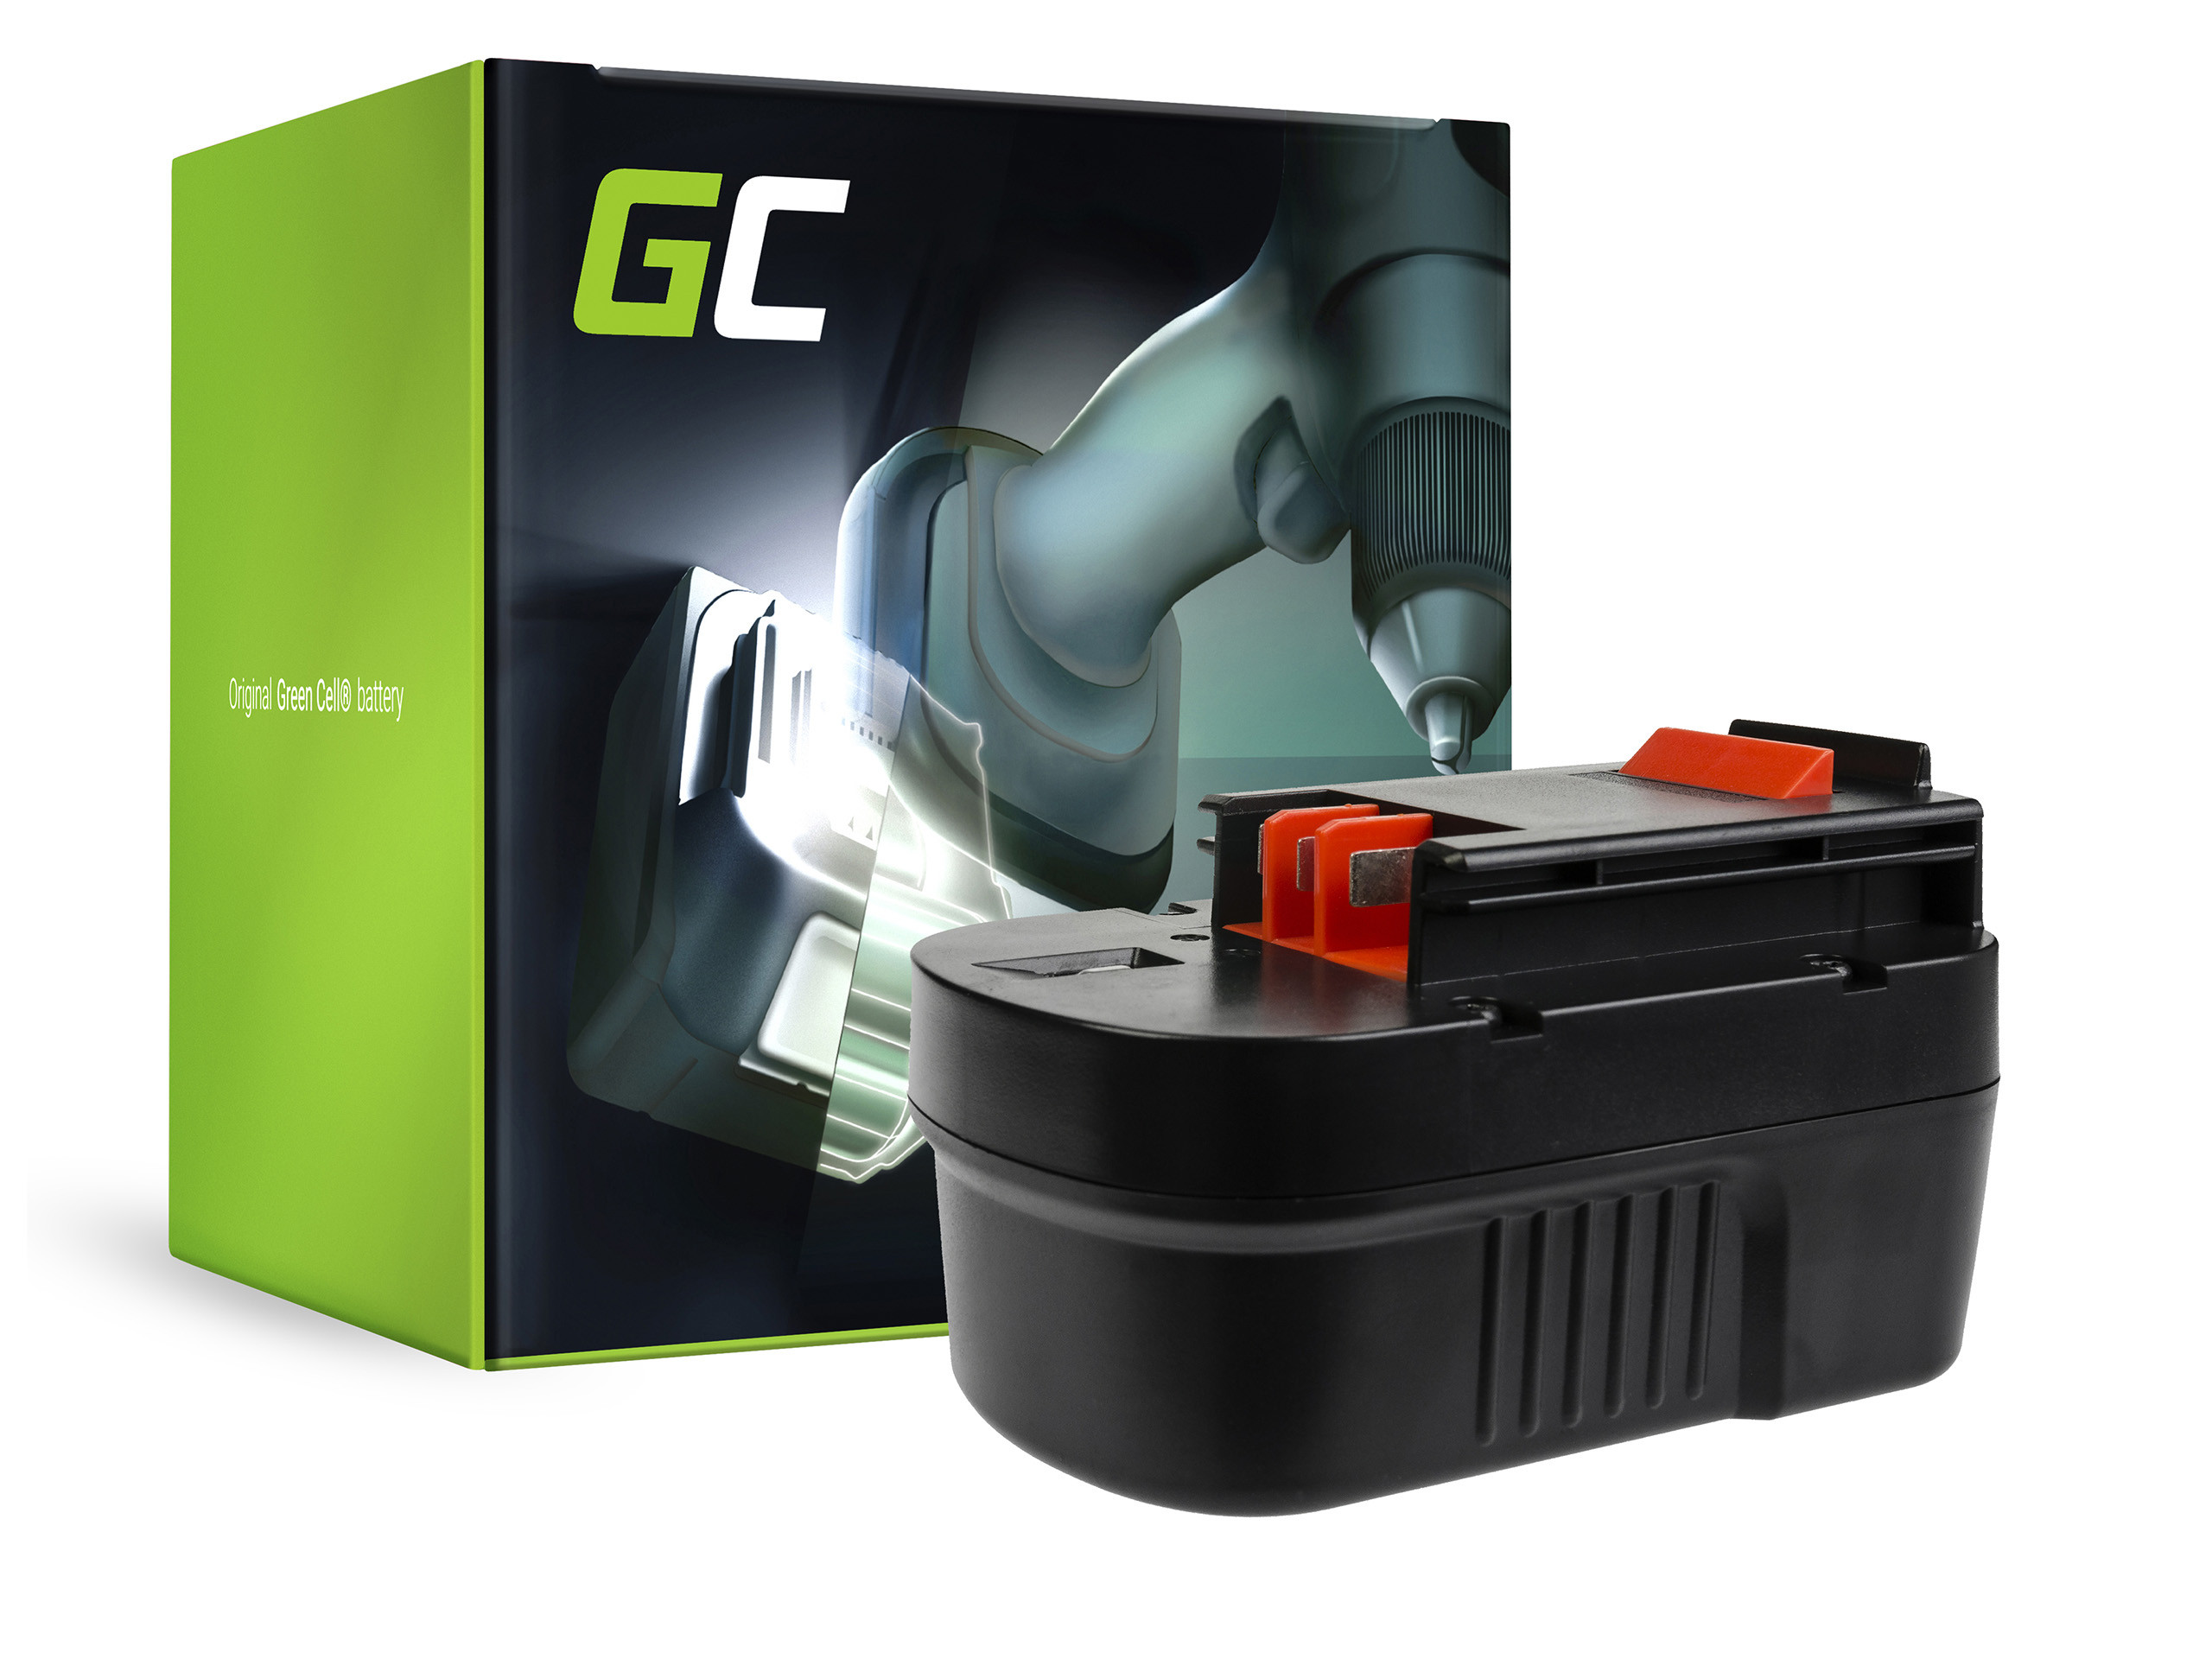 Baterie Green Cell Baterie Black&Decker CP14K EPC14 EPC14CA HP142K XTC143 FS1400 FS14PS PS142K A14 14.4V 3000mAh Ni-MH – neoriginální